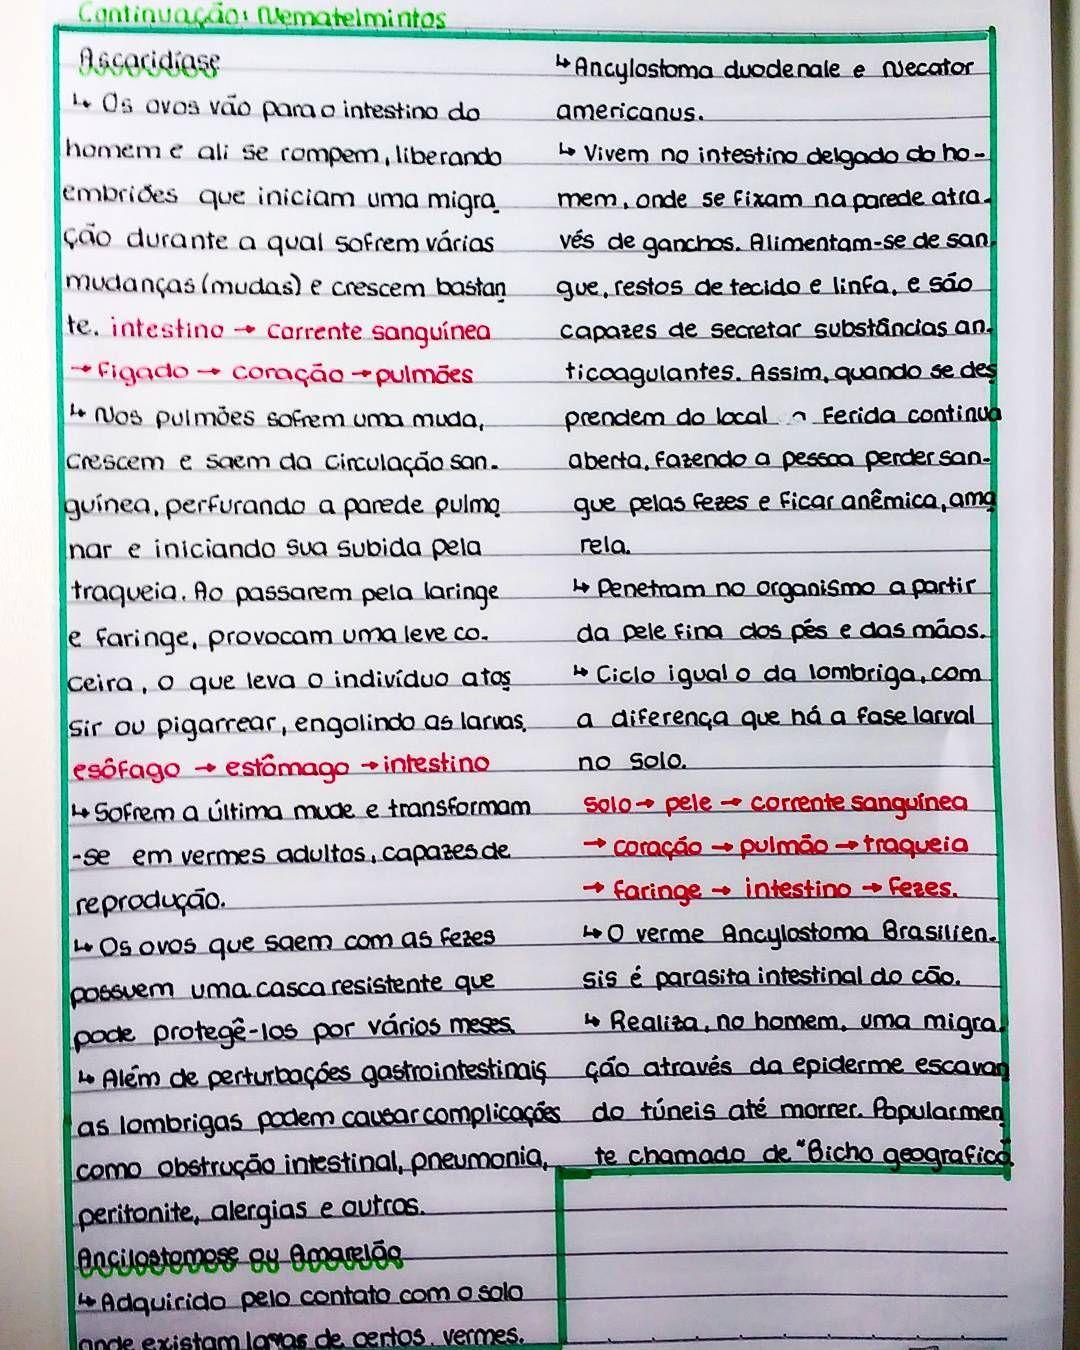 oxiuros tratamiento argentina)